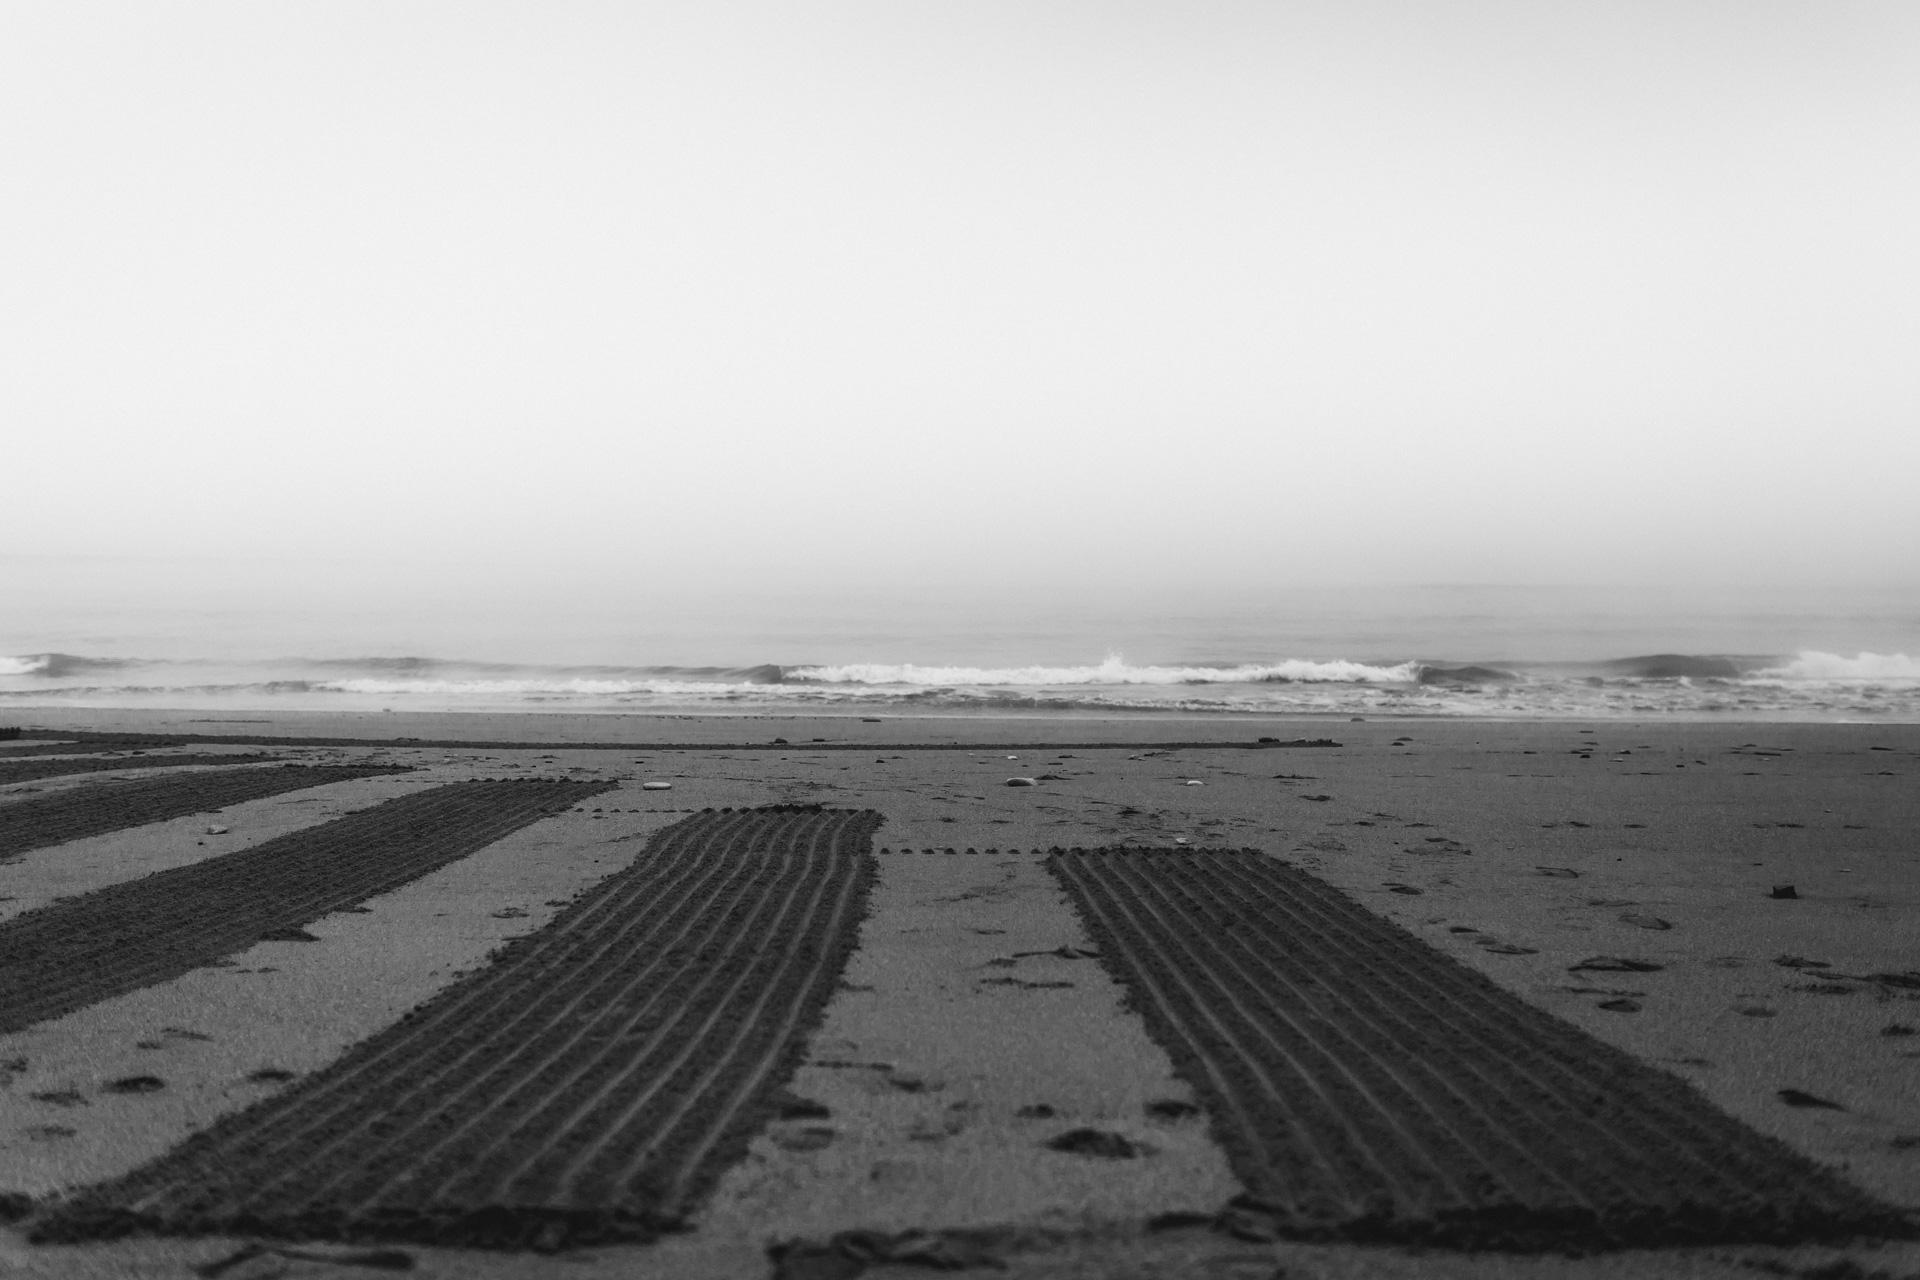 Damien-dohmen-sand-print-lx-one-11